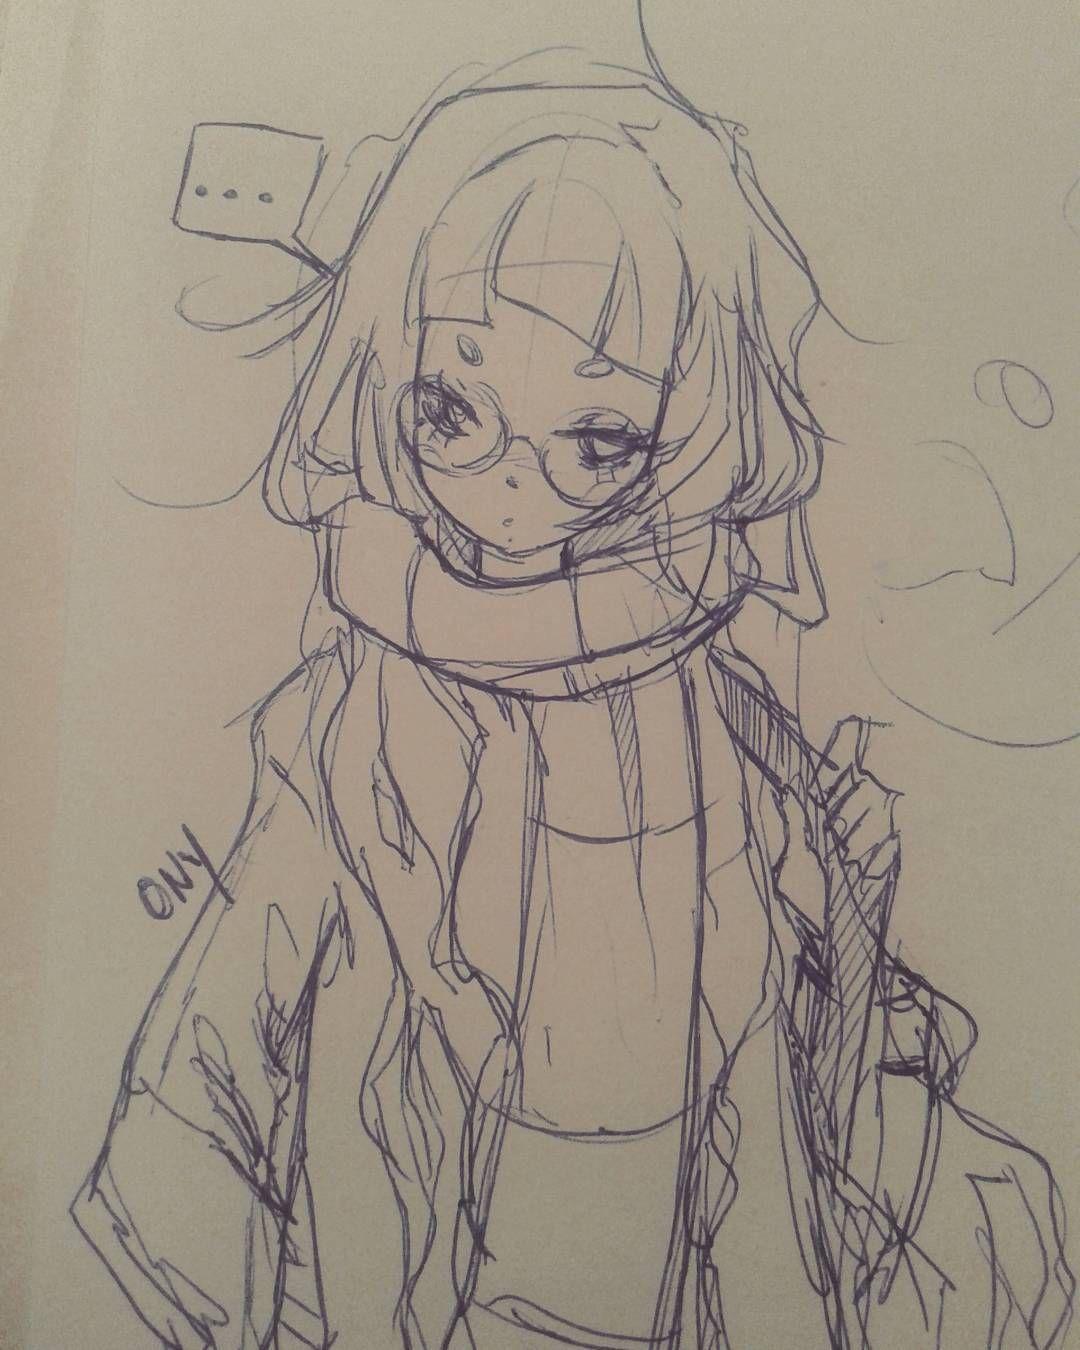 Ballpen Sketch Drawing Anime Manga Art Girl Japan Mori Kawaii Animeart Pen Doodle Artpromote Da Anime Drawings Sketches Cartoon Art Sketches